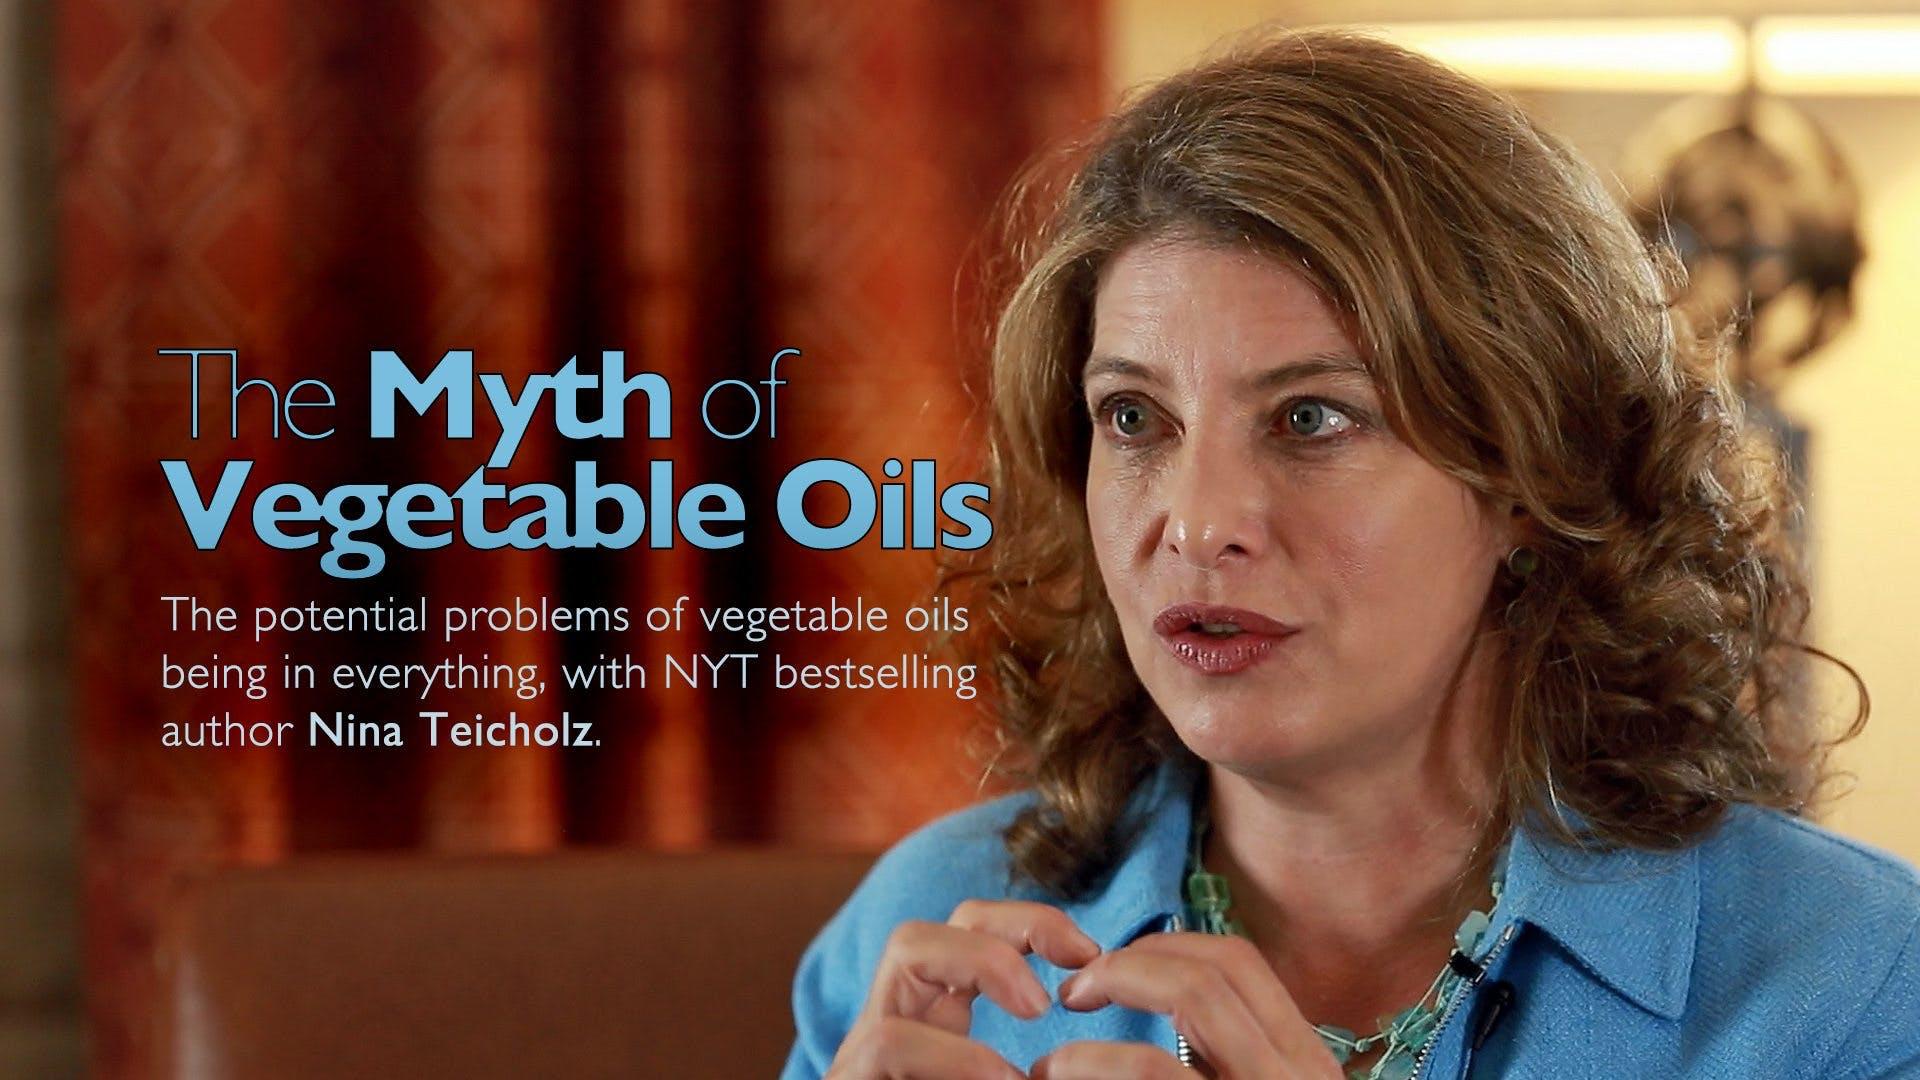 The Myth of Vegetable Oils